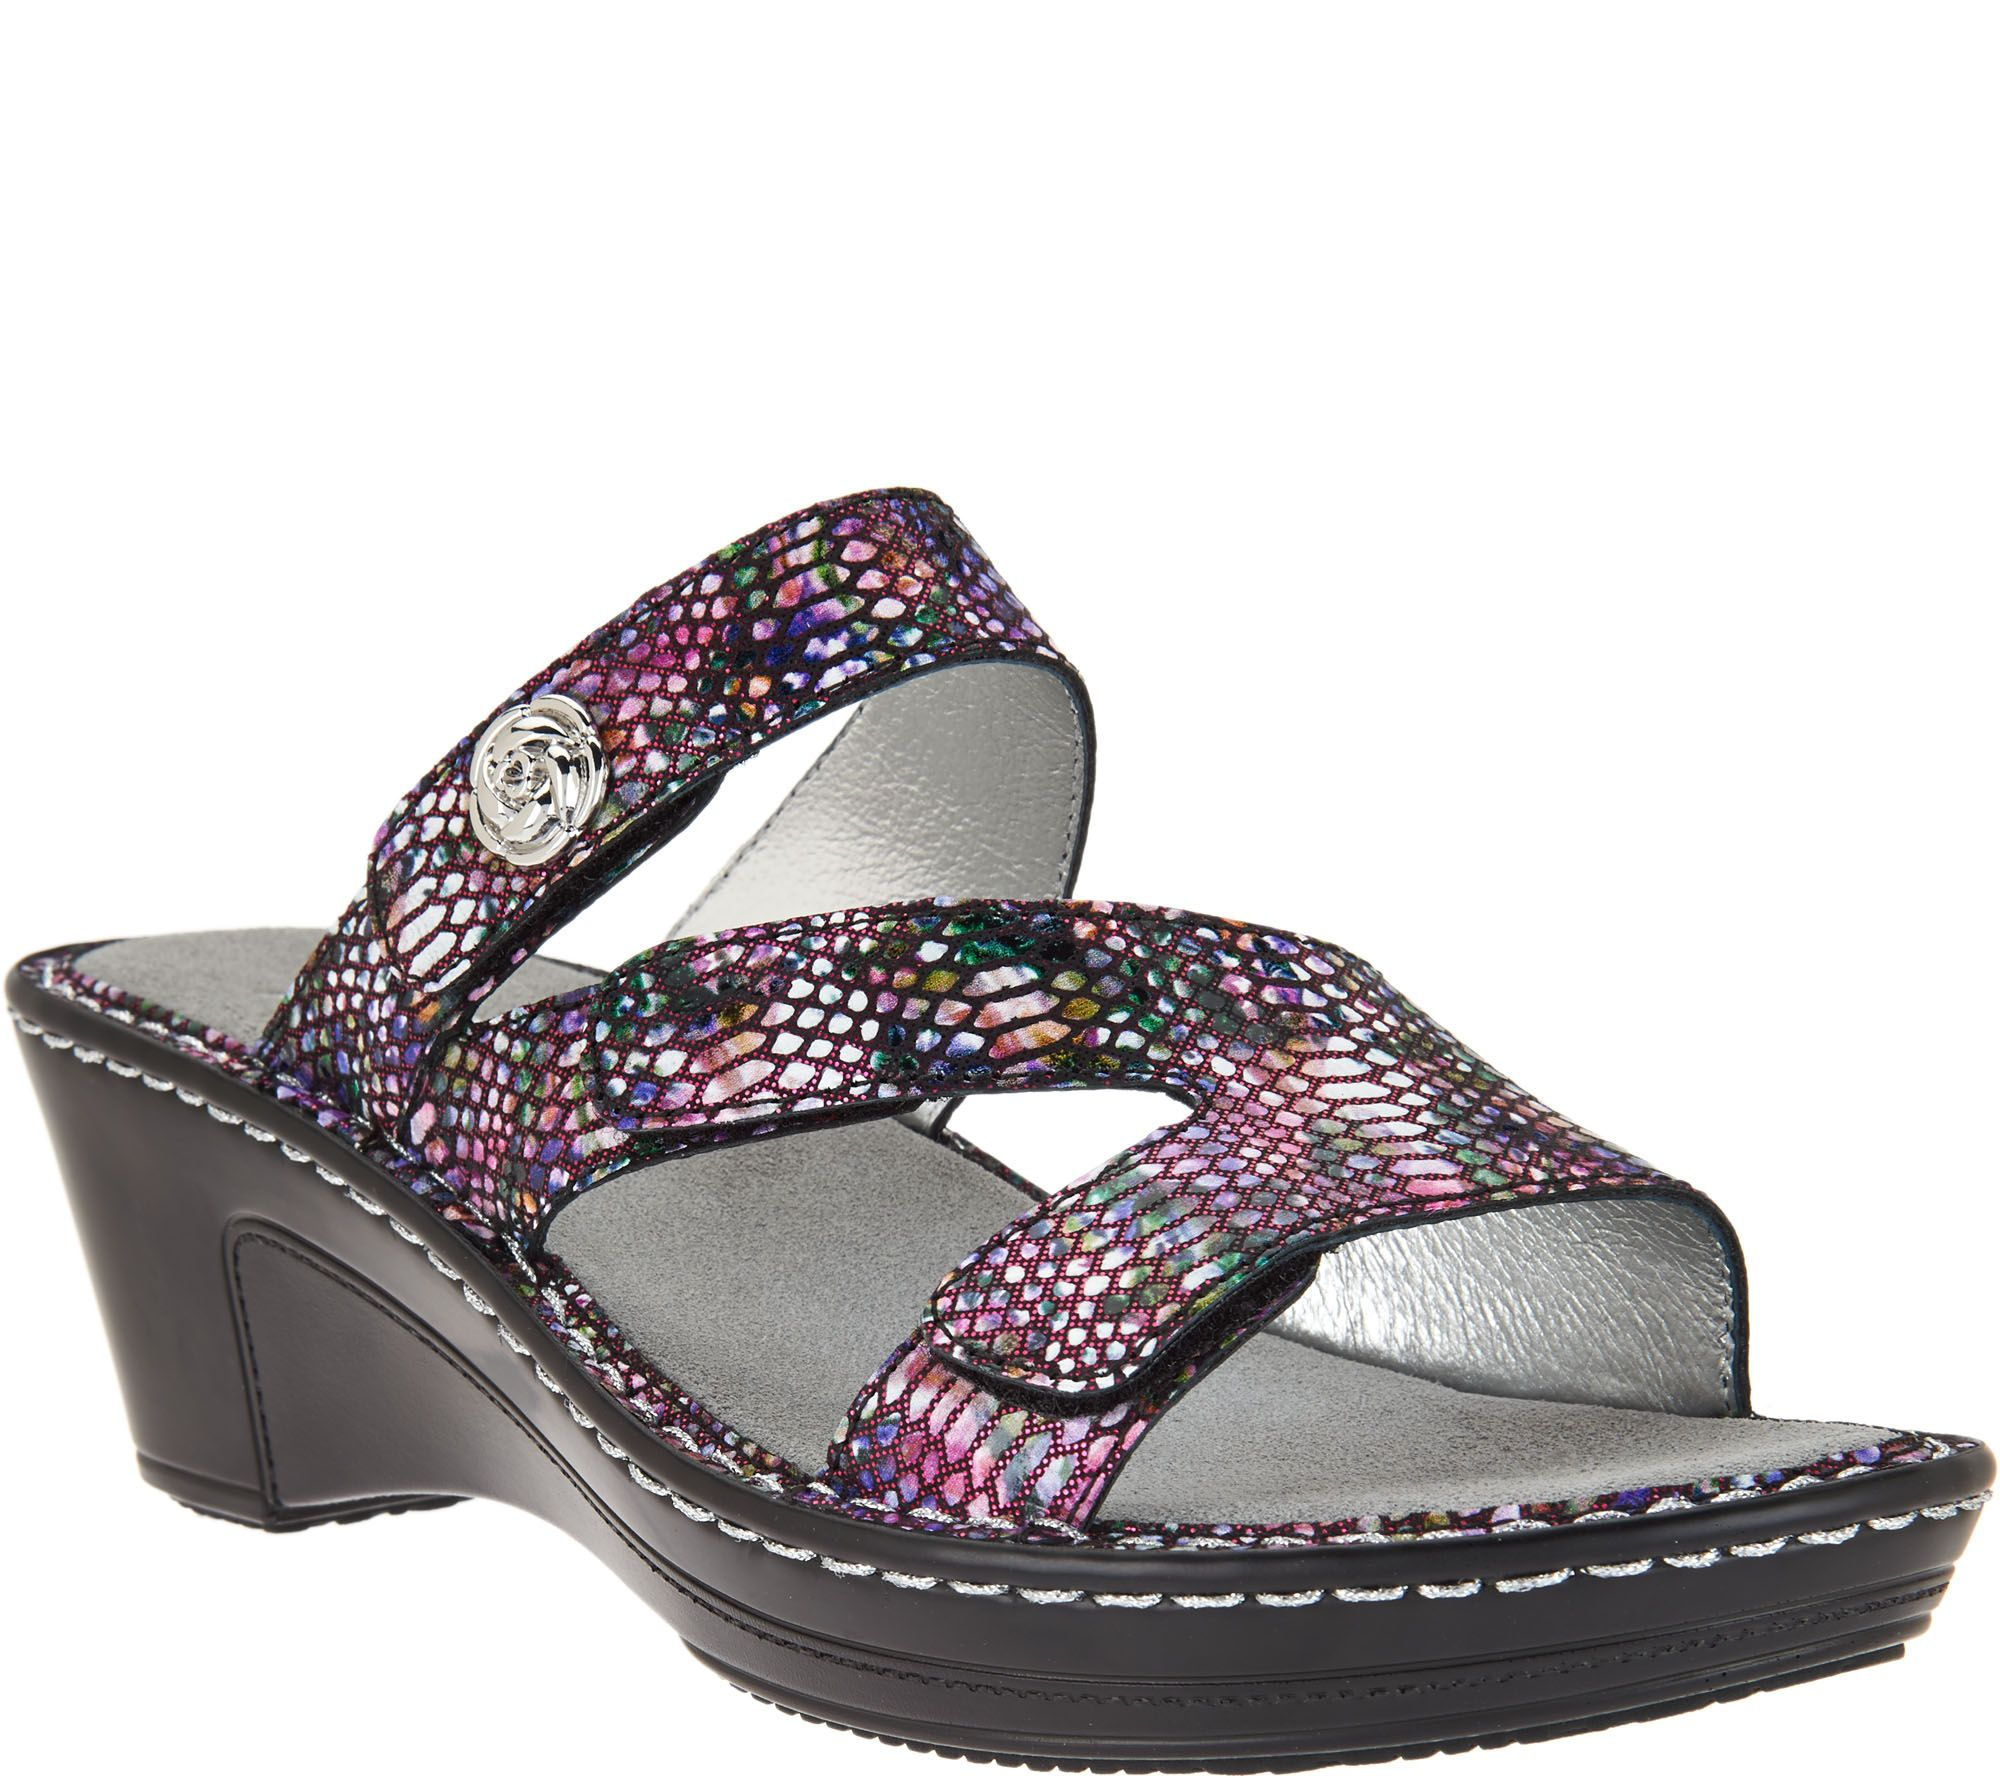 Black sandals belk - Alegria Leather Triple Strap Wedge Sandals Loti A288230